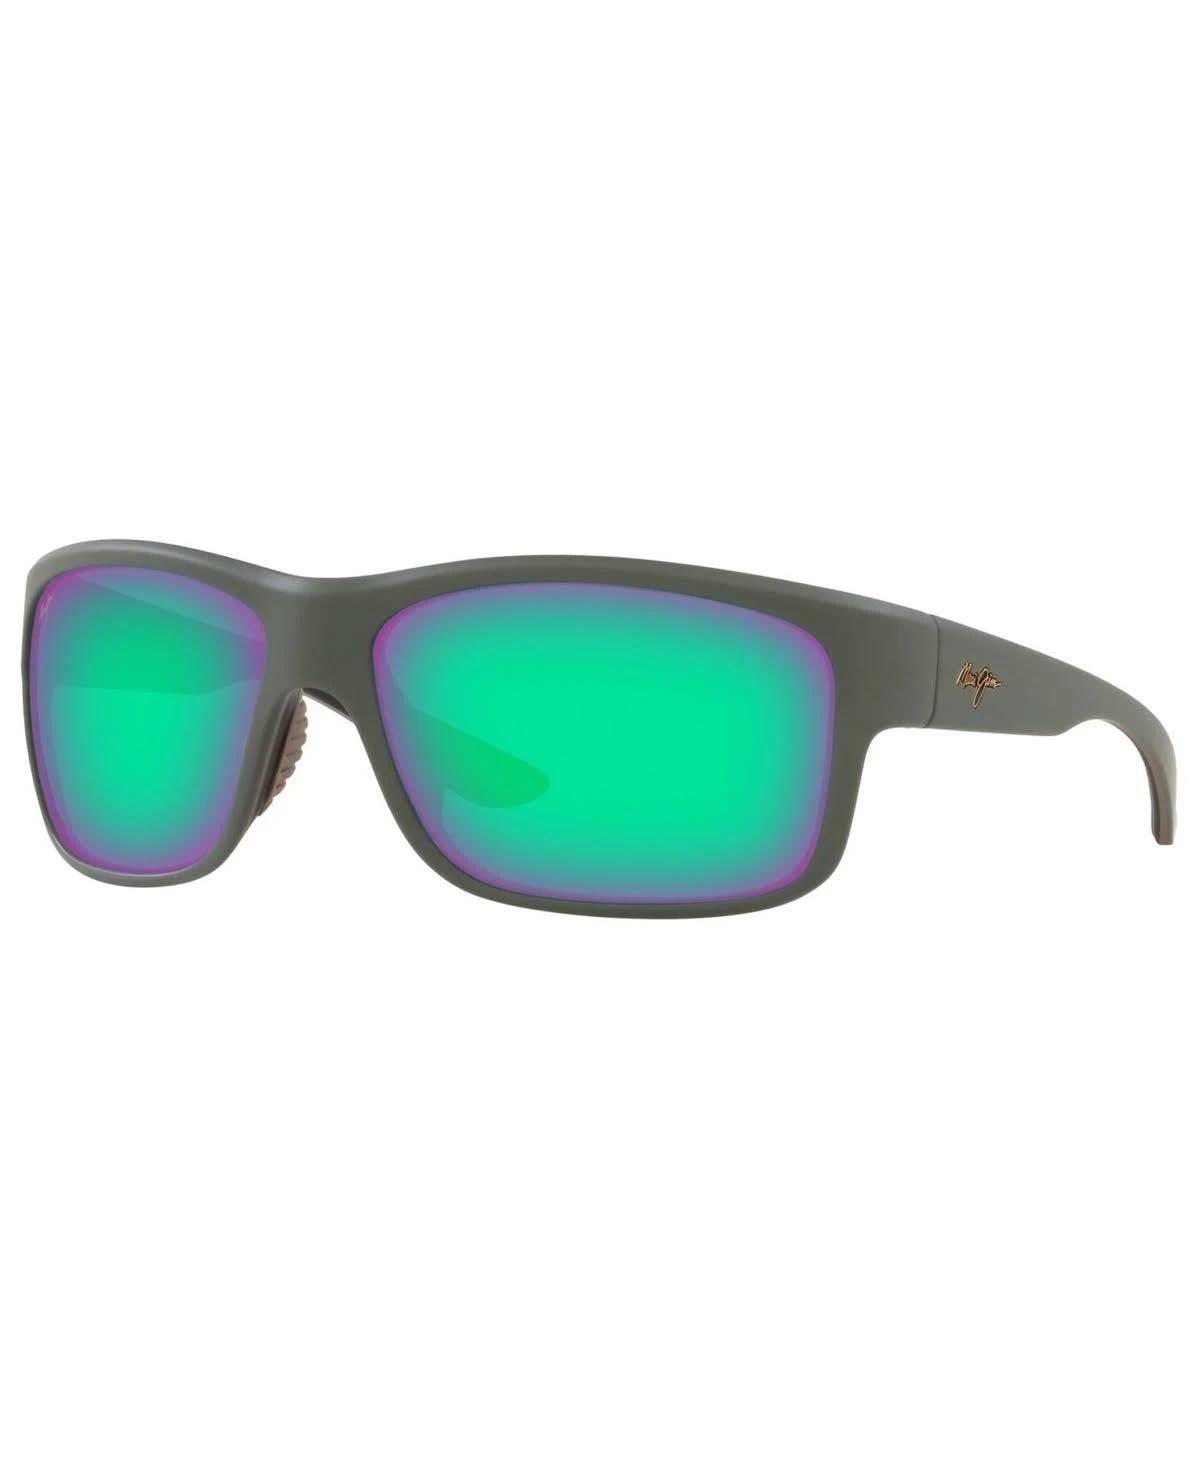 Maui Jim Southern Cross MAUIGreen, Polarized Wrap Sunglasses